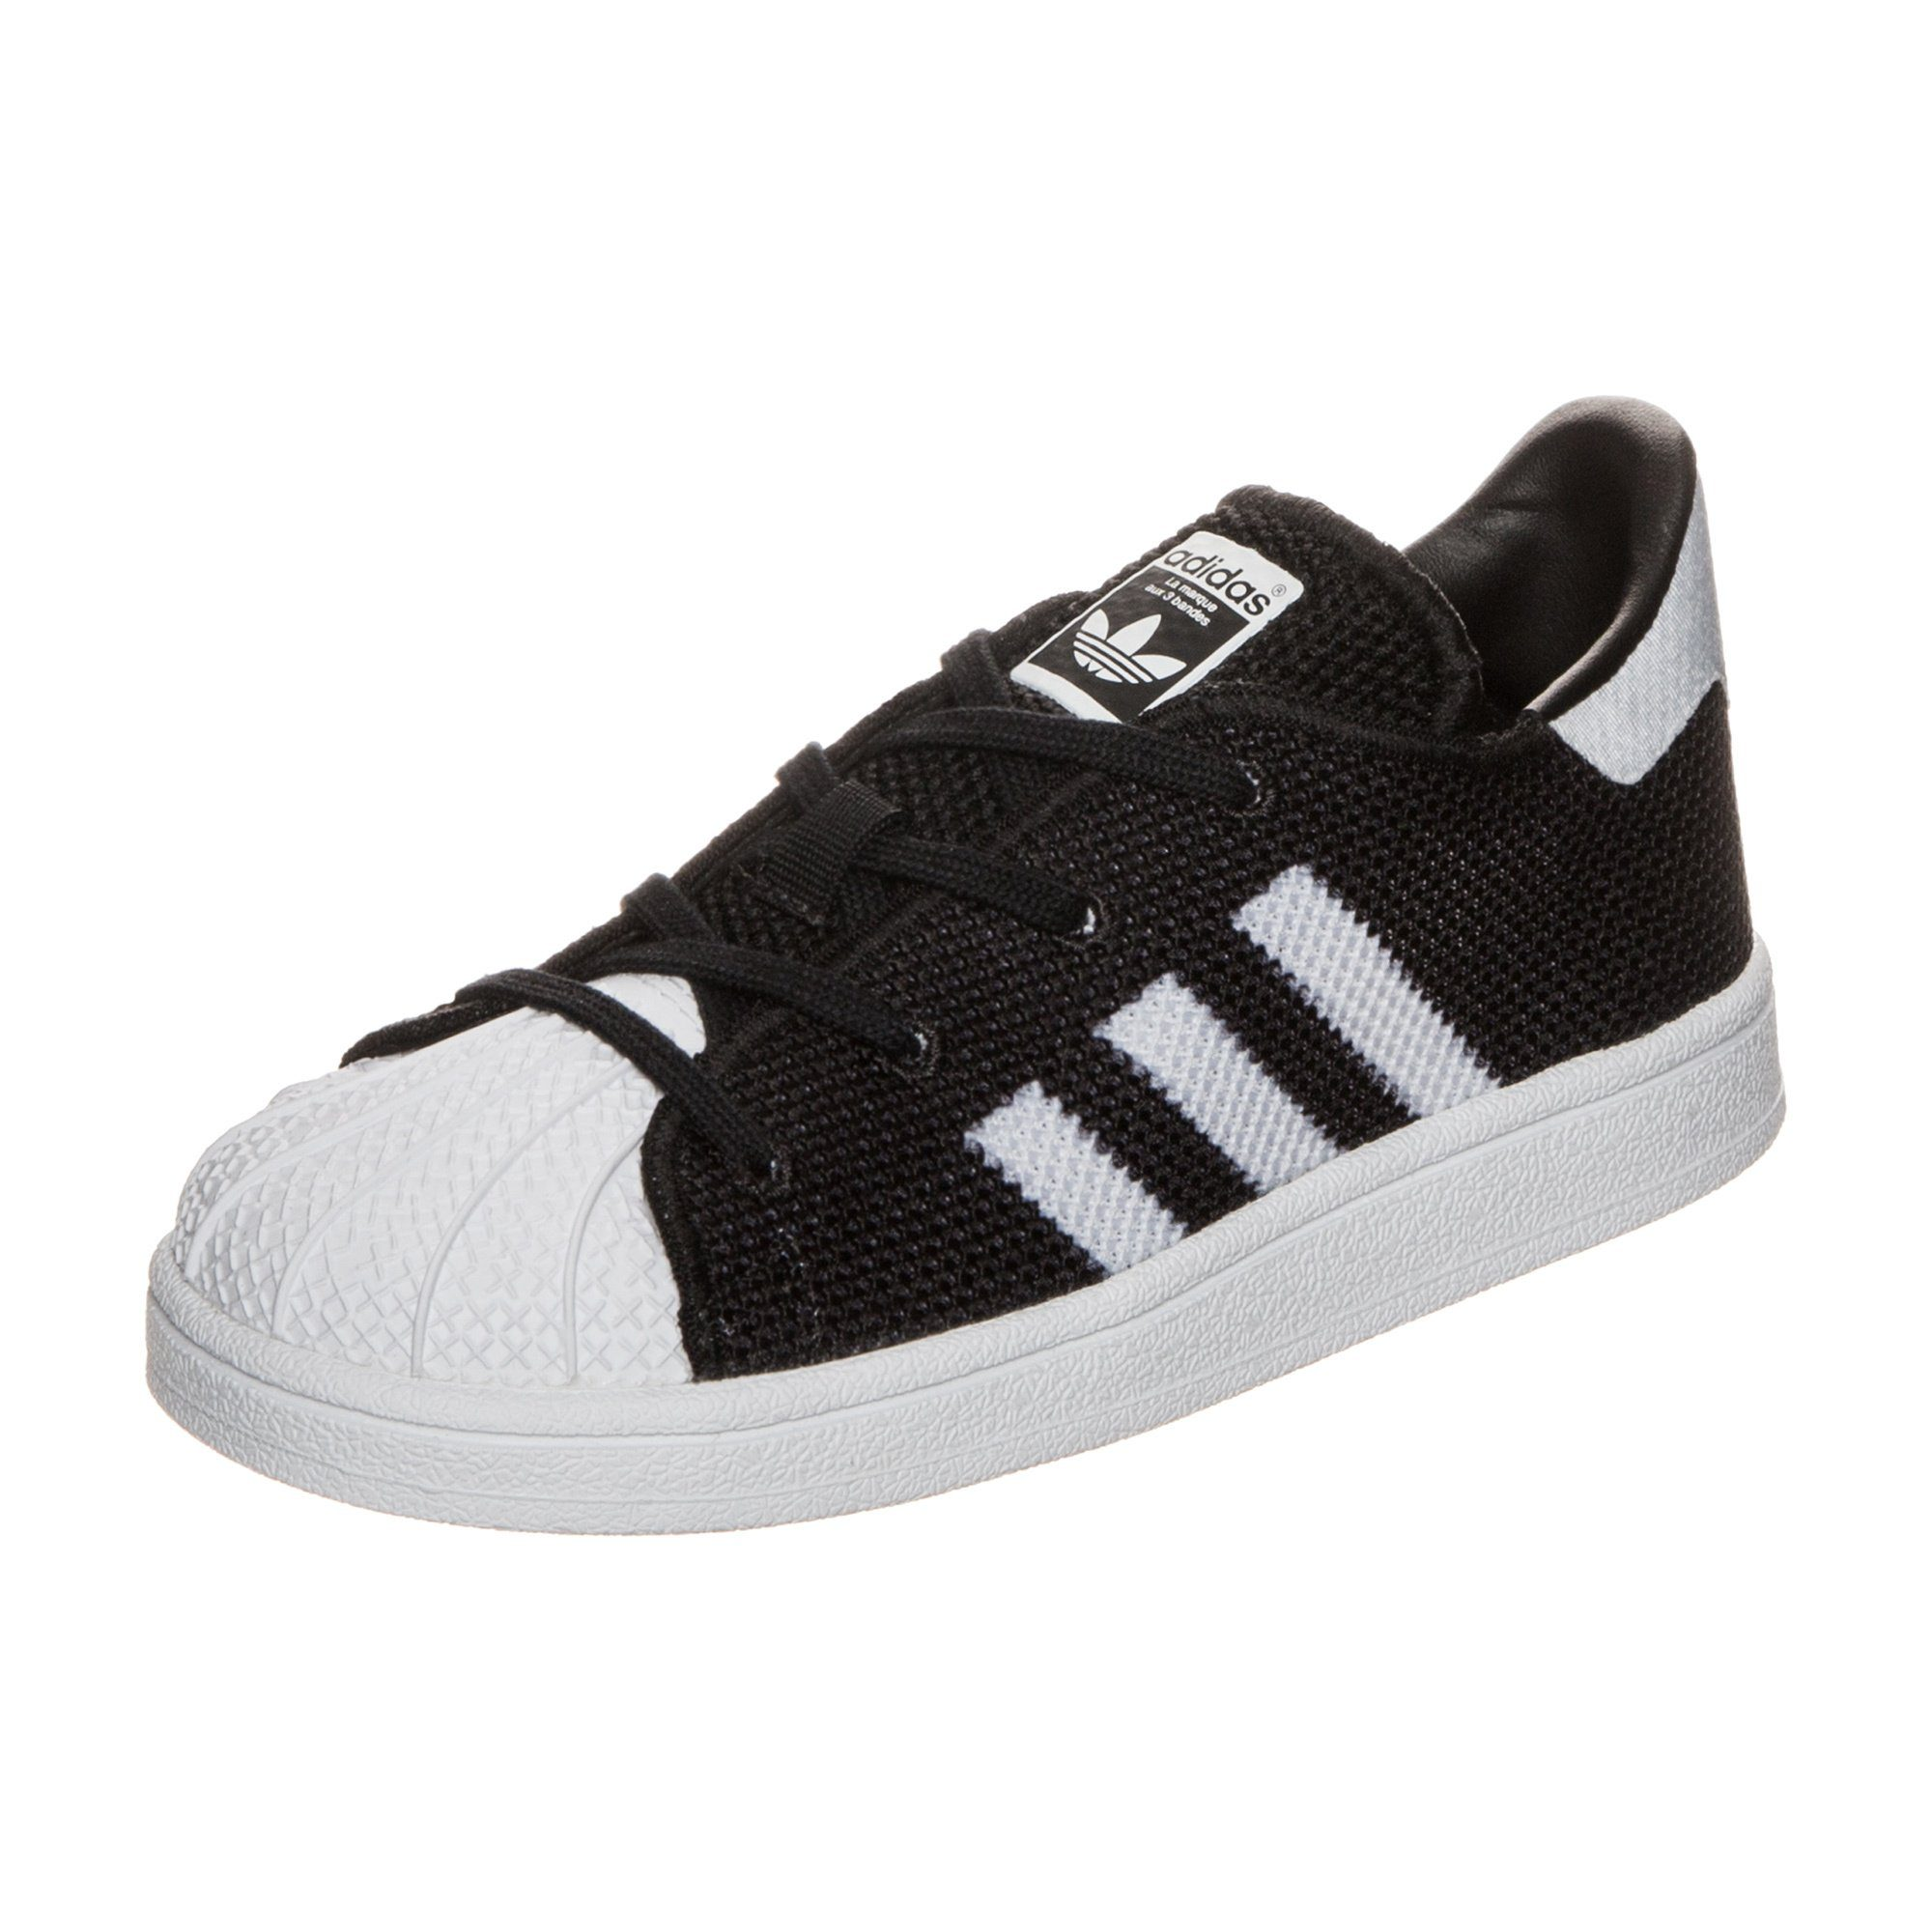 huge selection of 1f045 a7a14 Bildquelle  adidas Originals Superstar Sneaker Kleinkinder